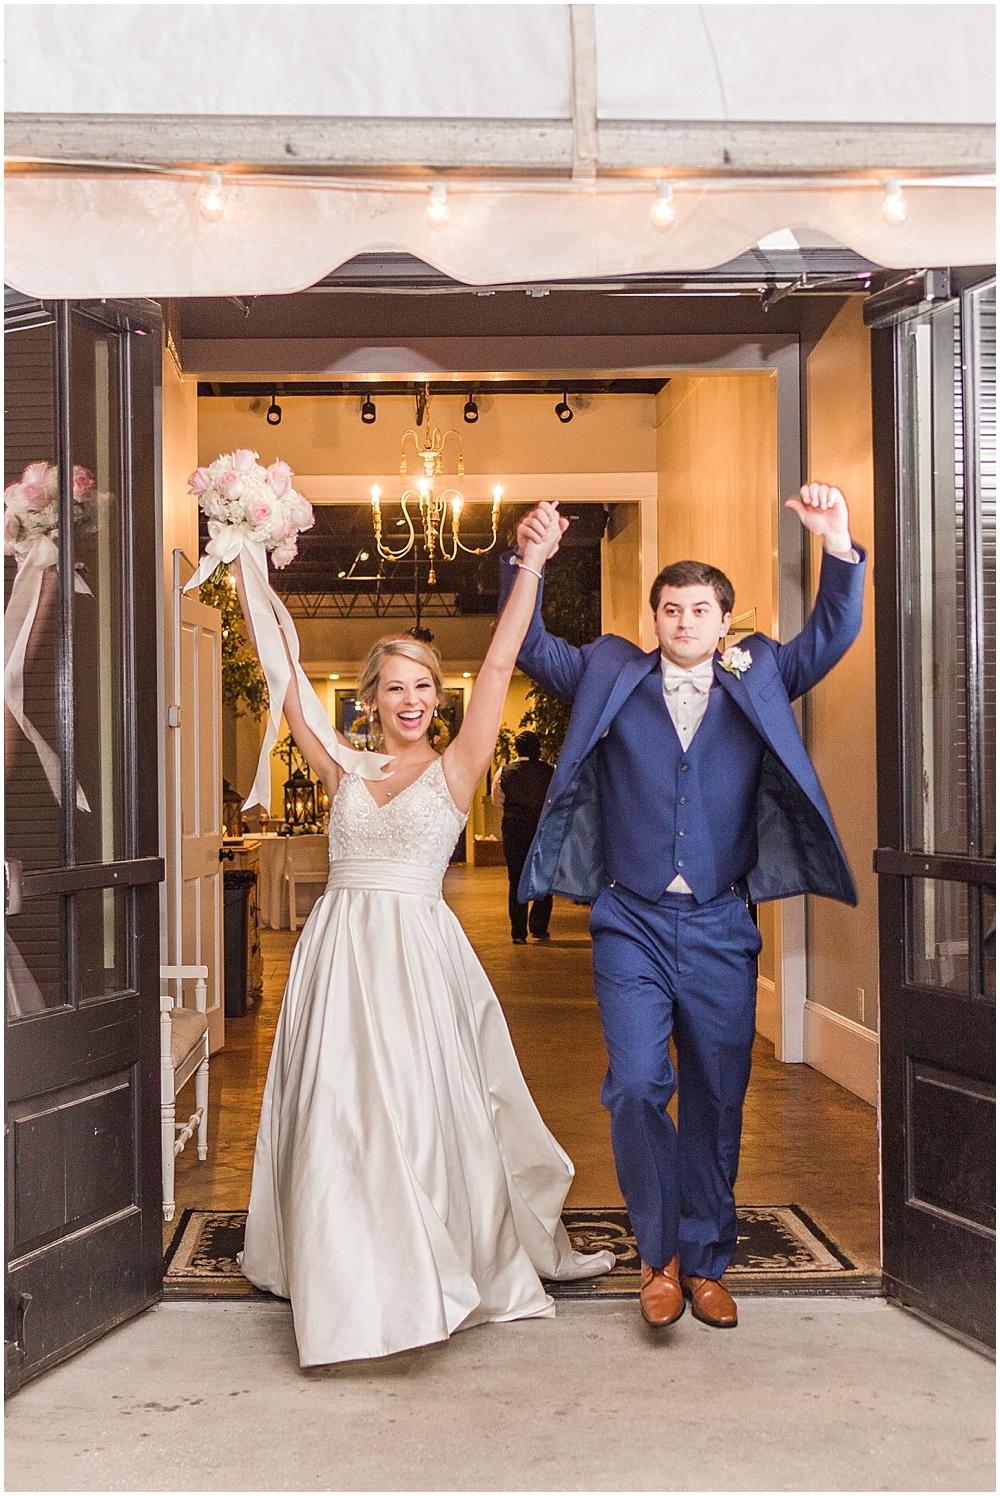 Ashton-Clark-Photography-Wedding-Portrait-Family-Photographer-Mobile-Alabama_0355.jpg